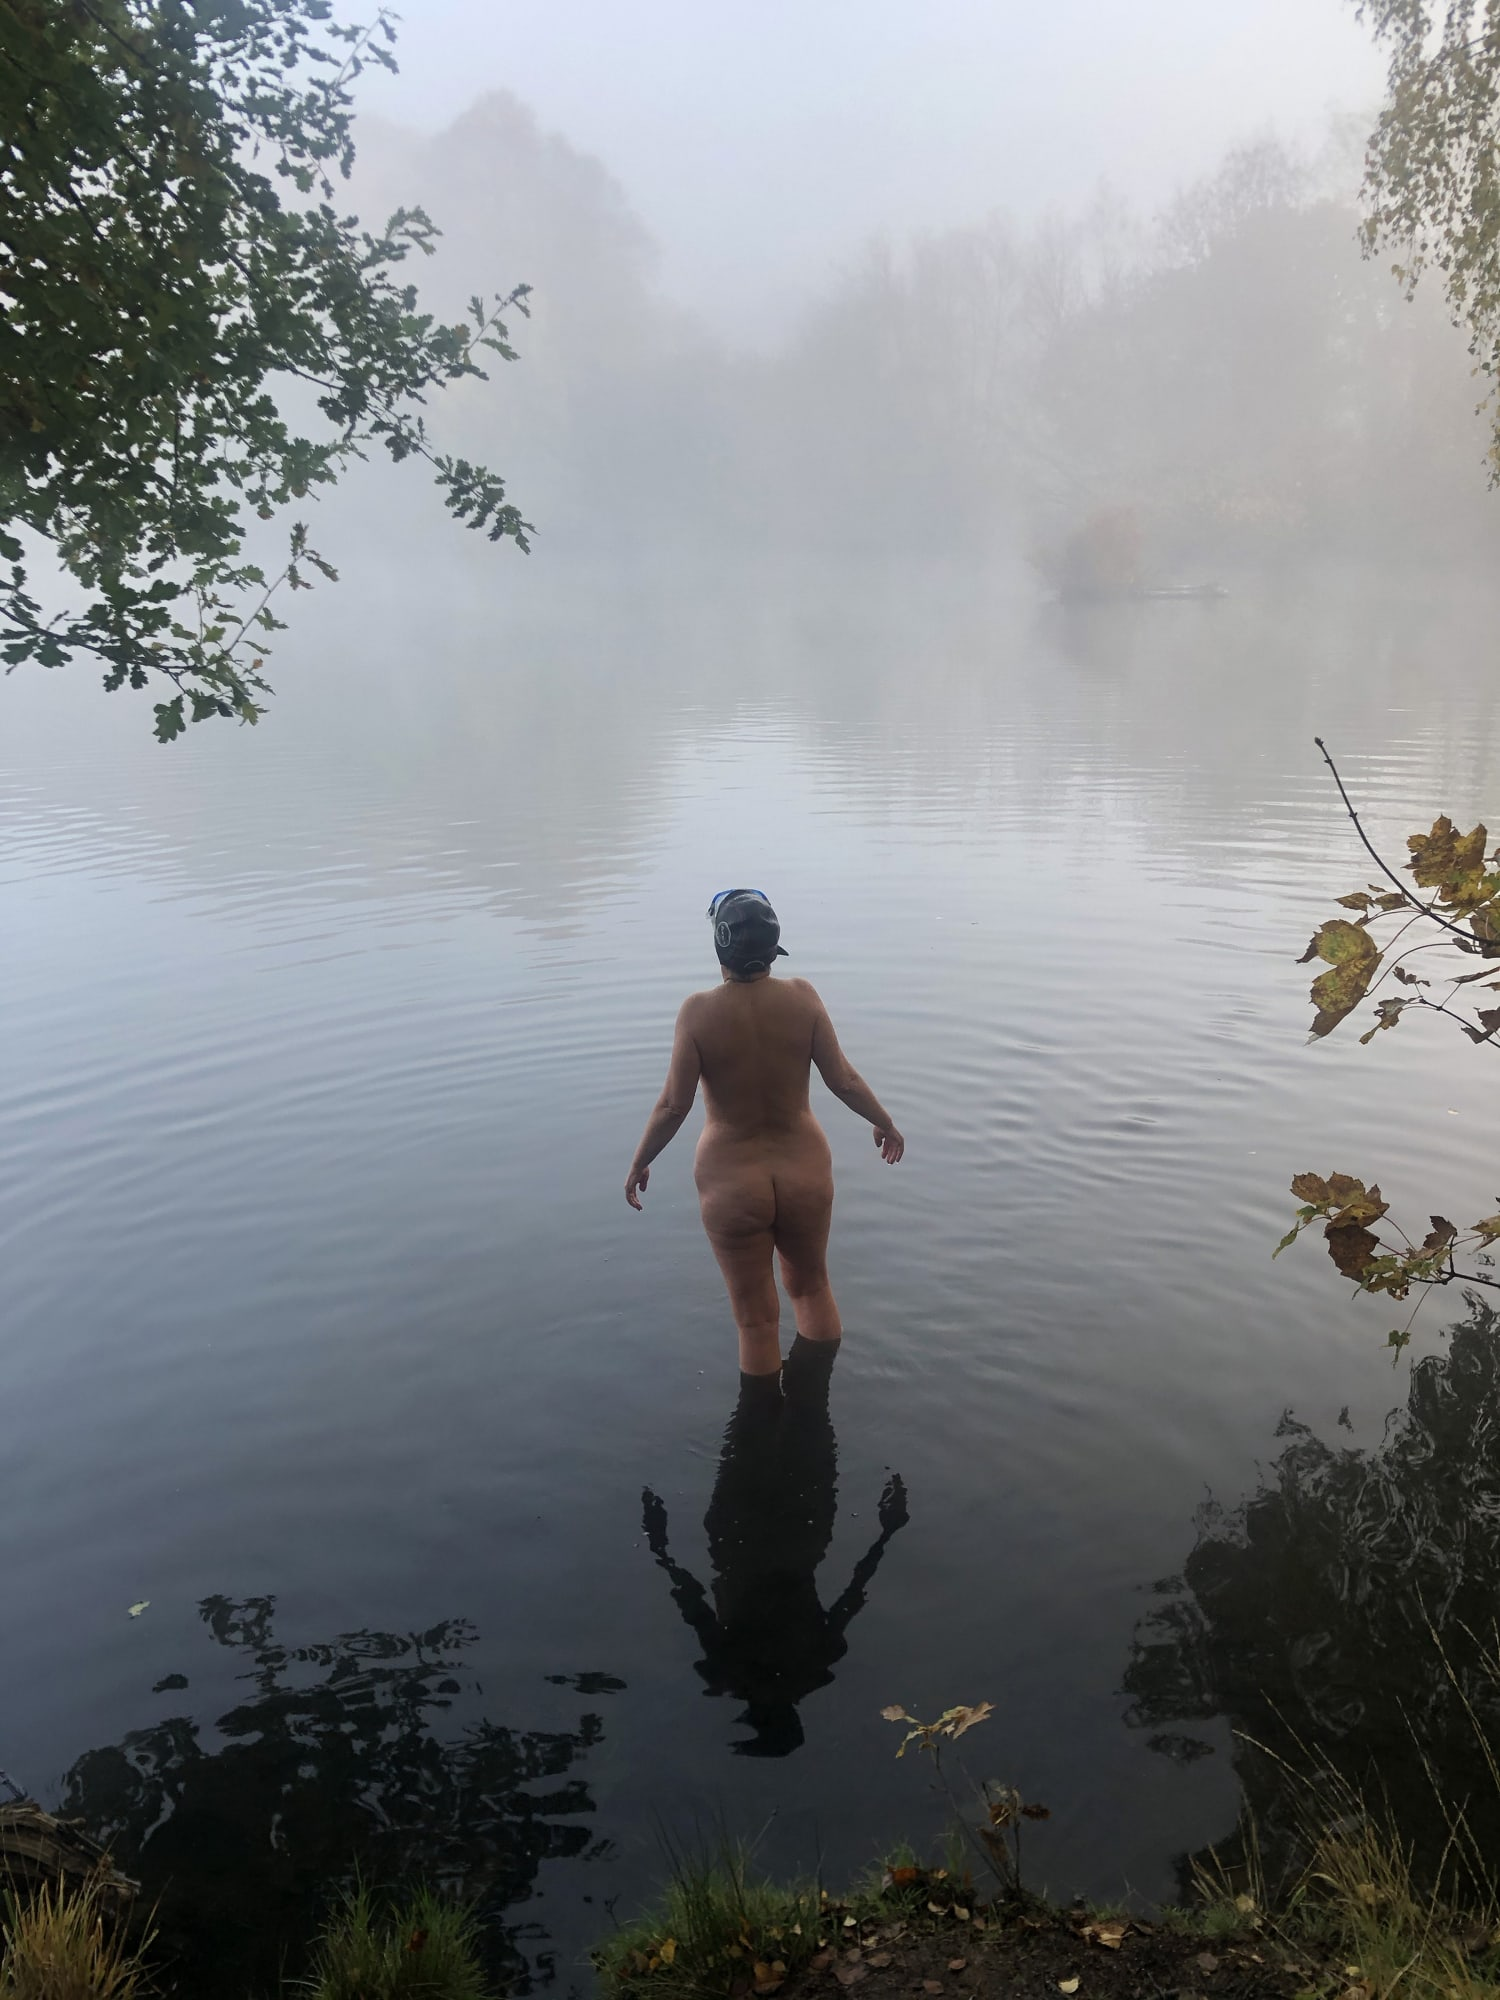 Jillian Edelstein: WATER RATS